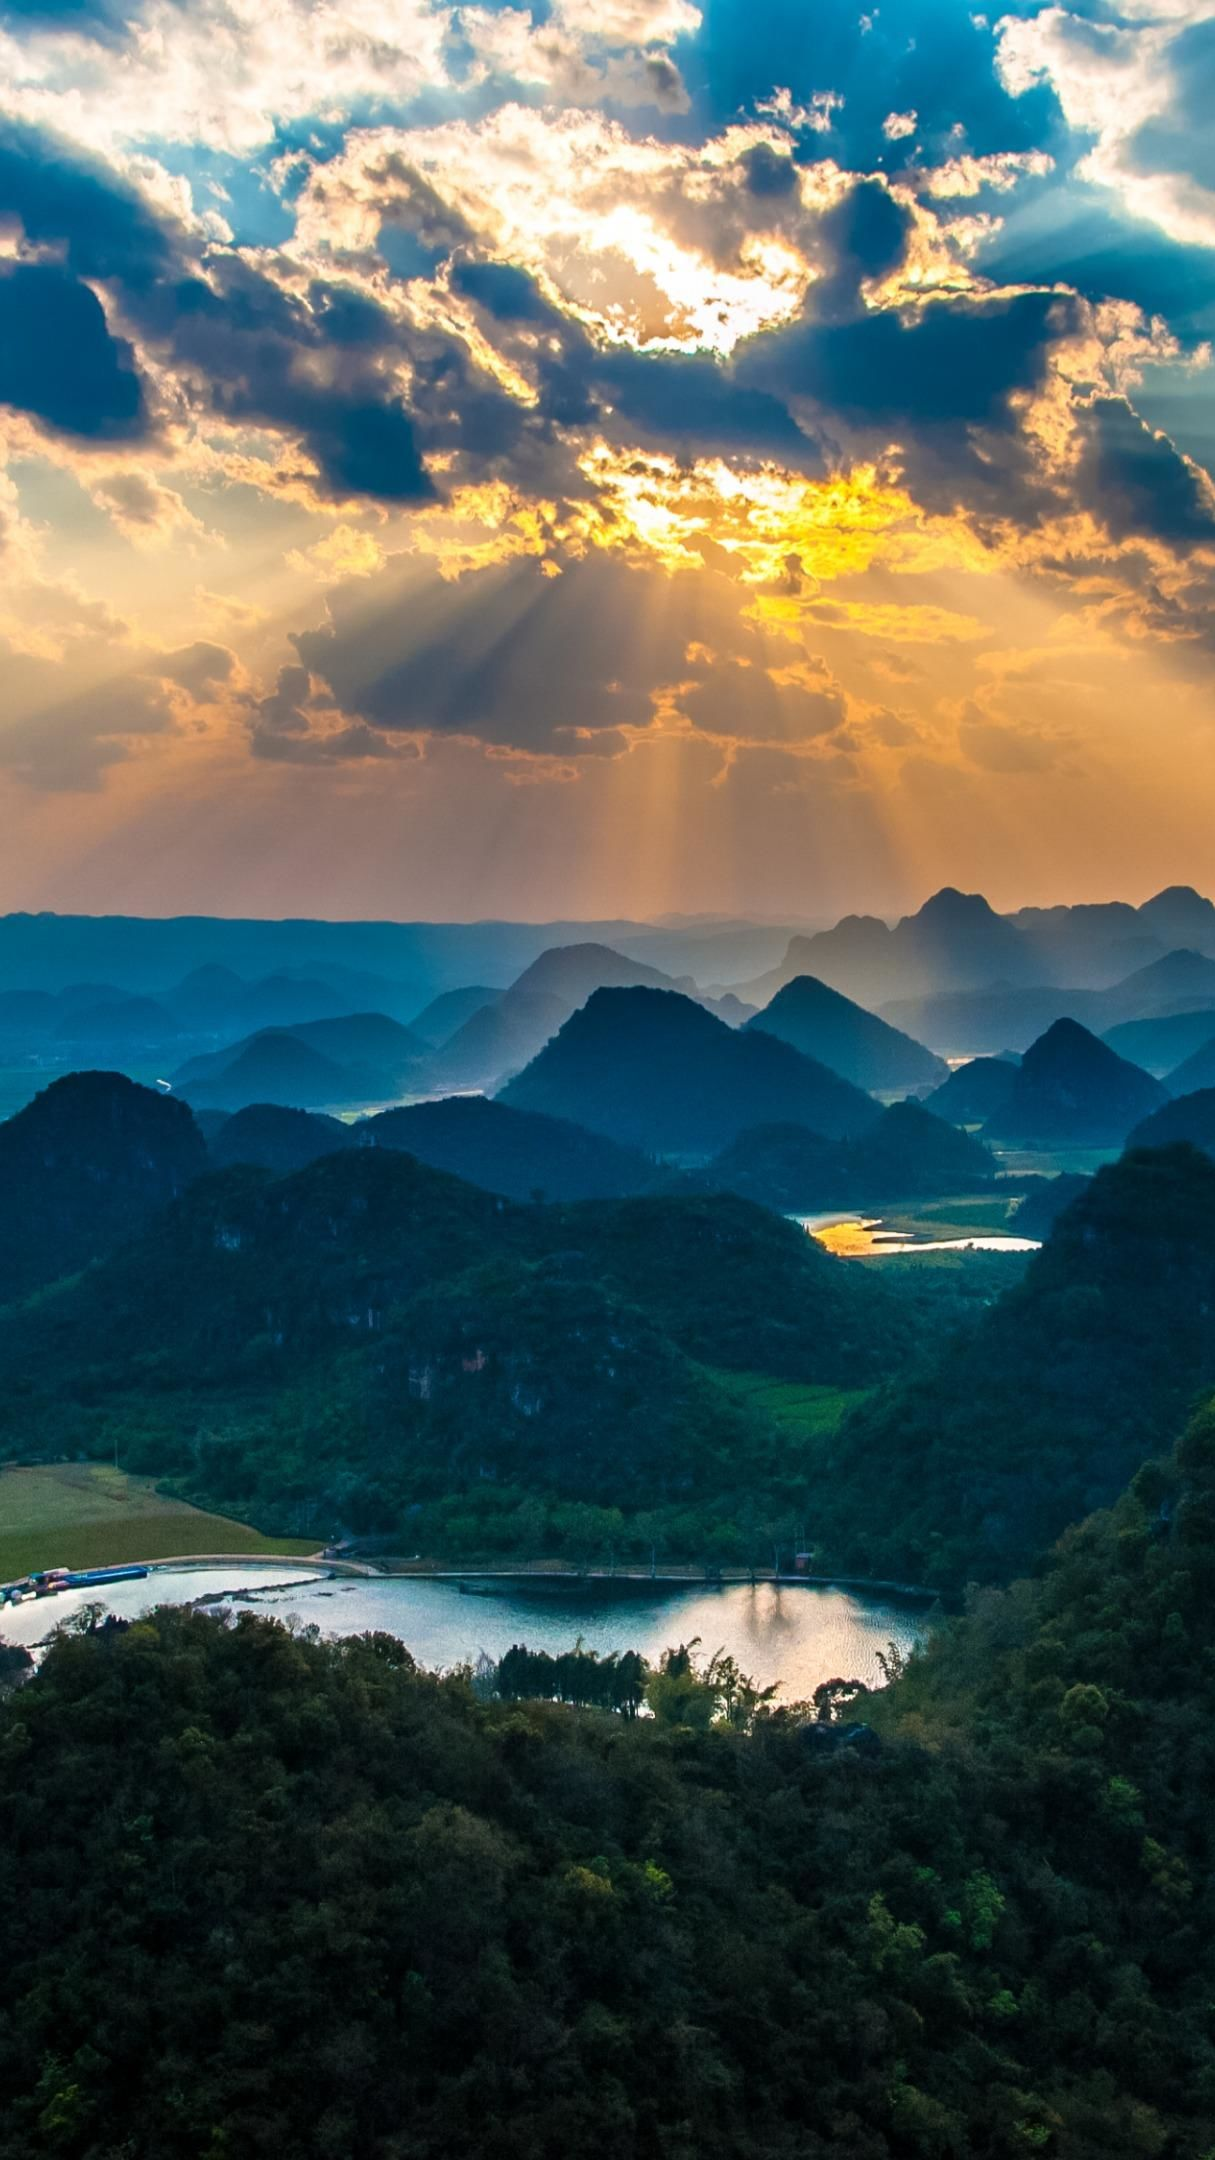 Karst Landscape Of Puzhehei At Sunset 4K UltraHD Wallpaper ...